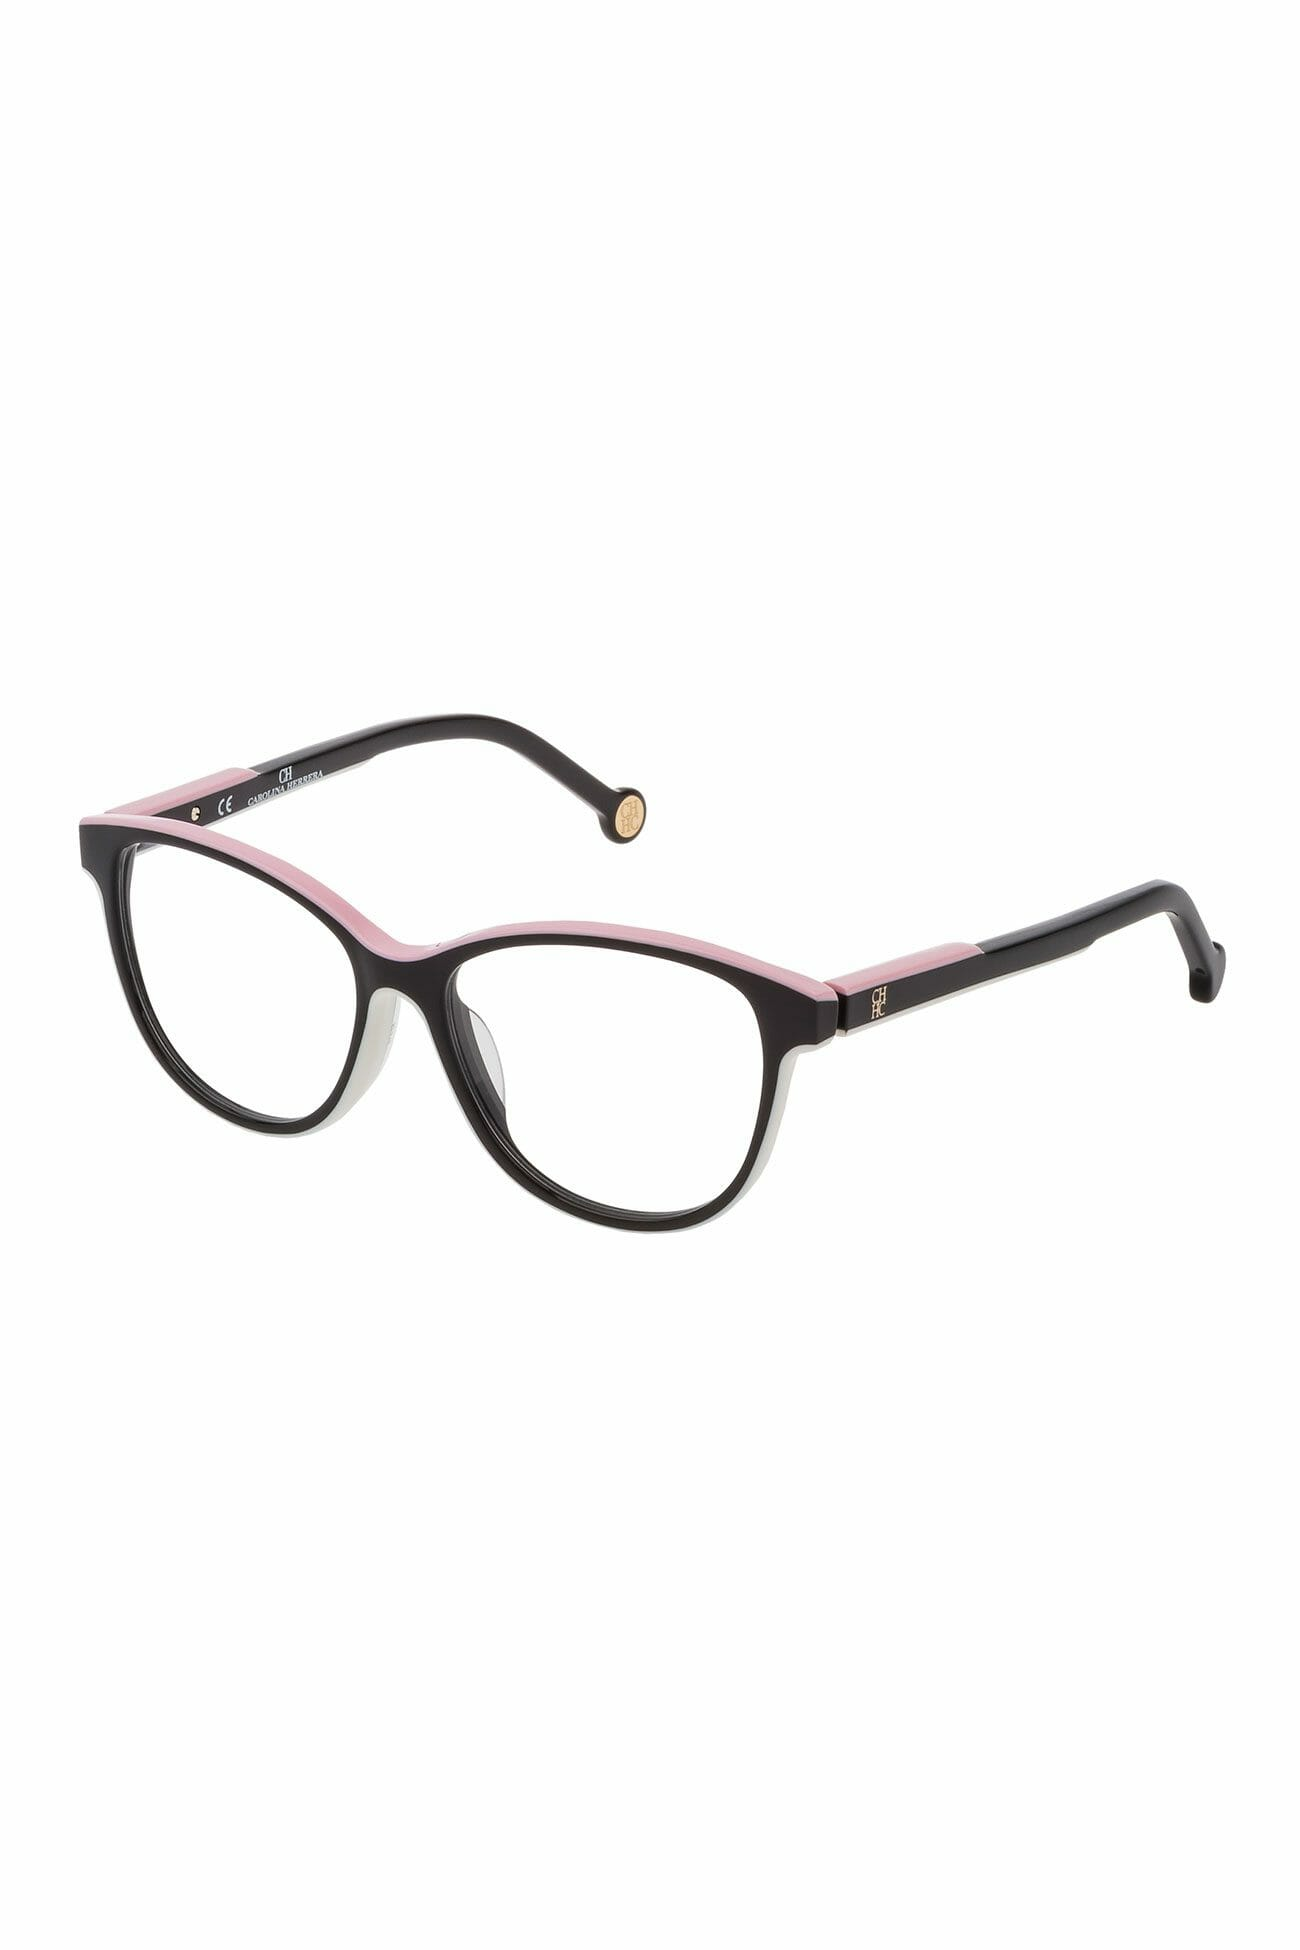 CH-Carolina-Herrera-Eyeglasses-optical-Women